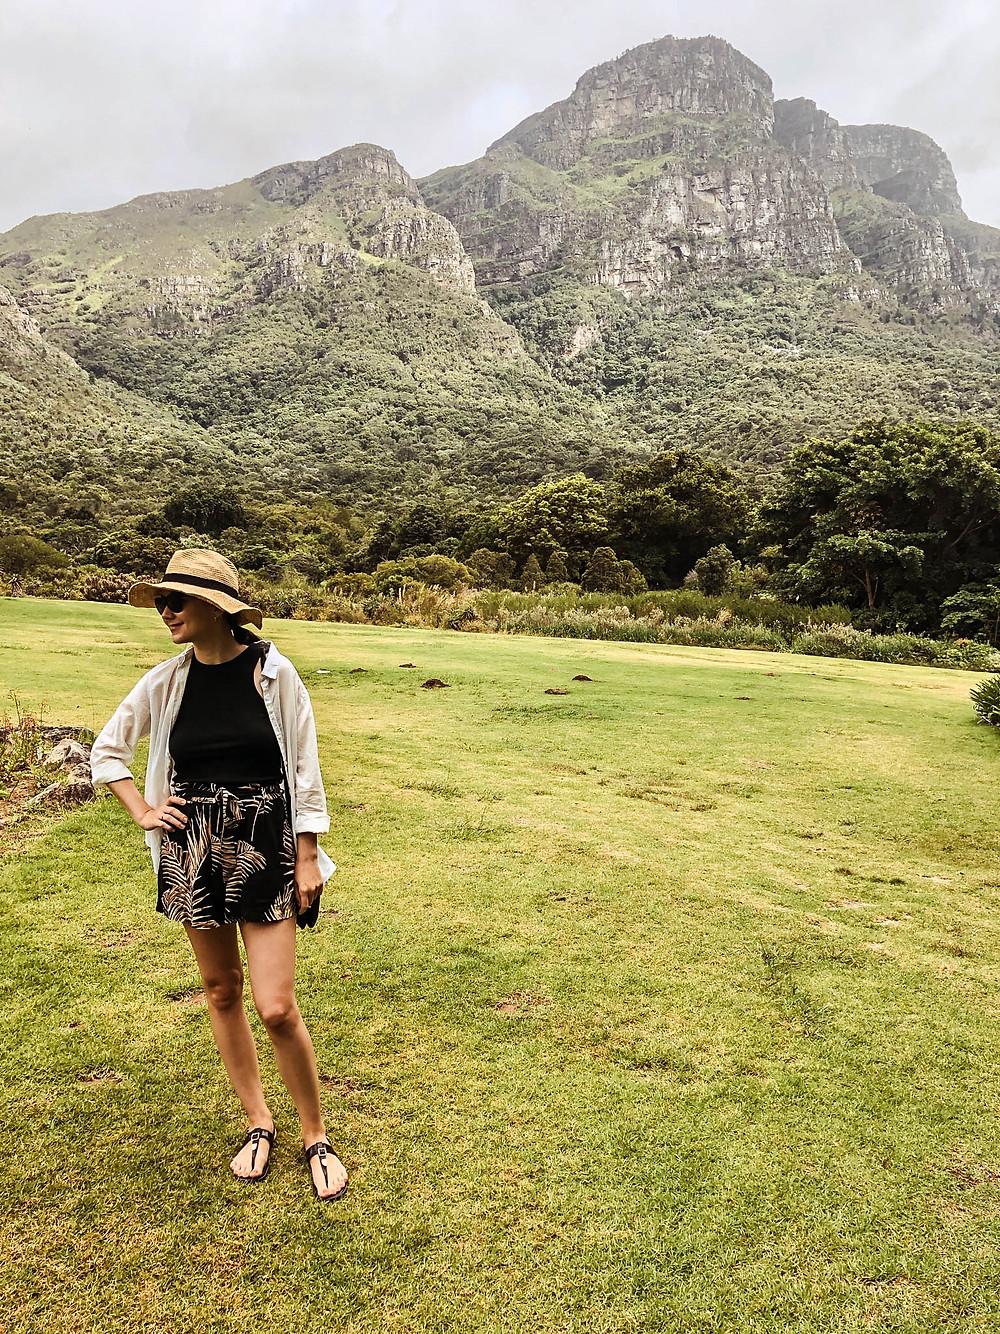 Enjoying some of Kirstenbosch's beautiful lawns